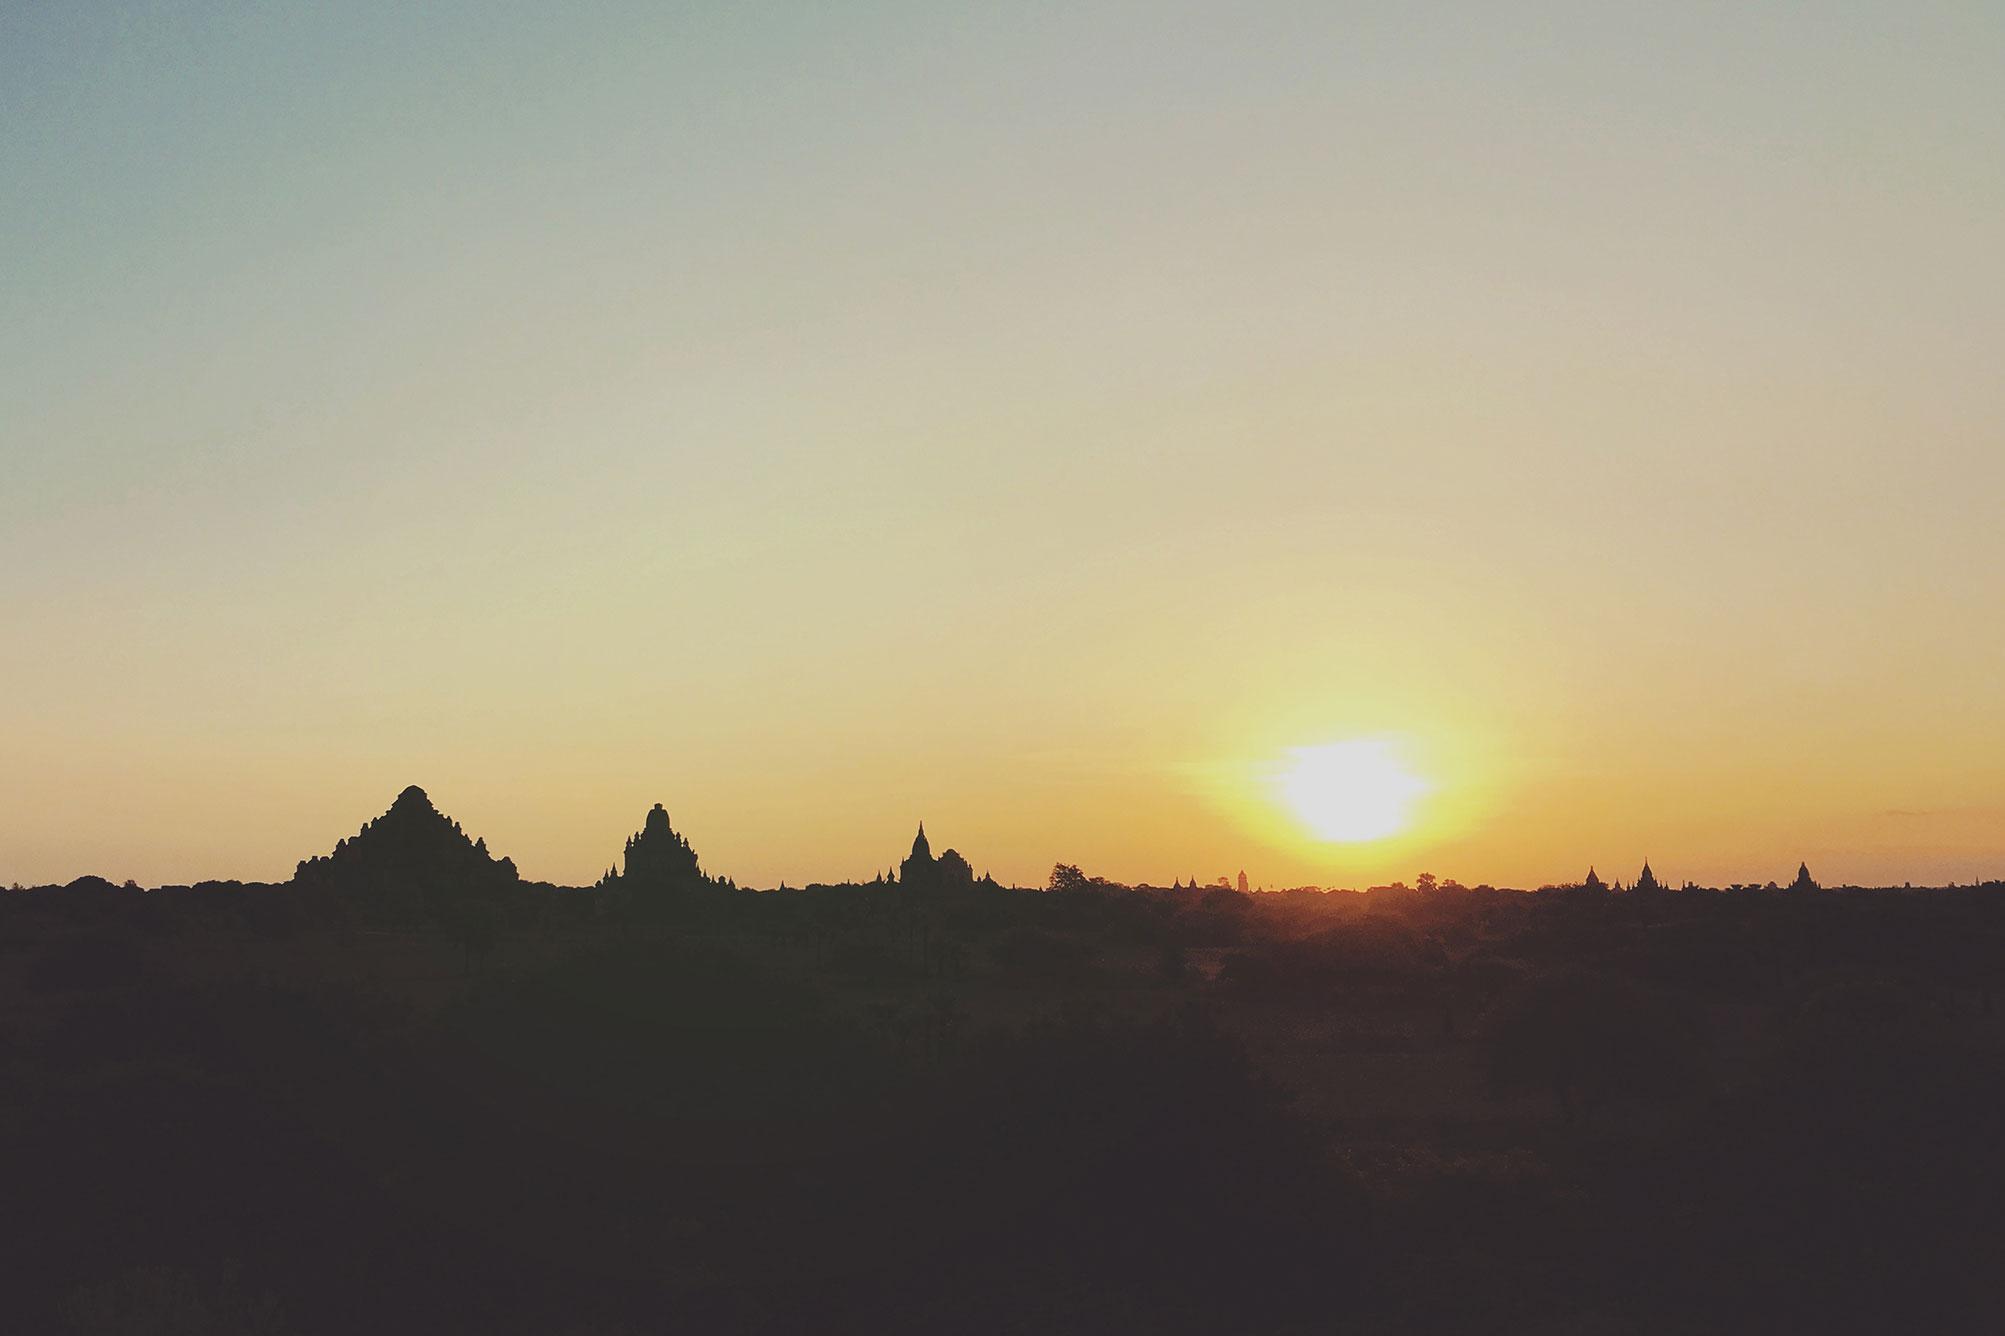 Sunrise seen from pagoda in Bagan Myanmar